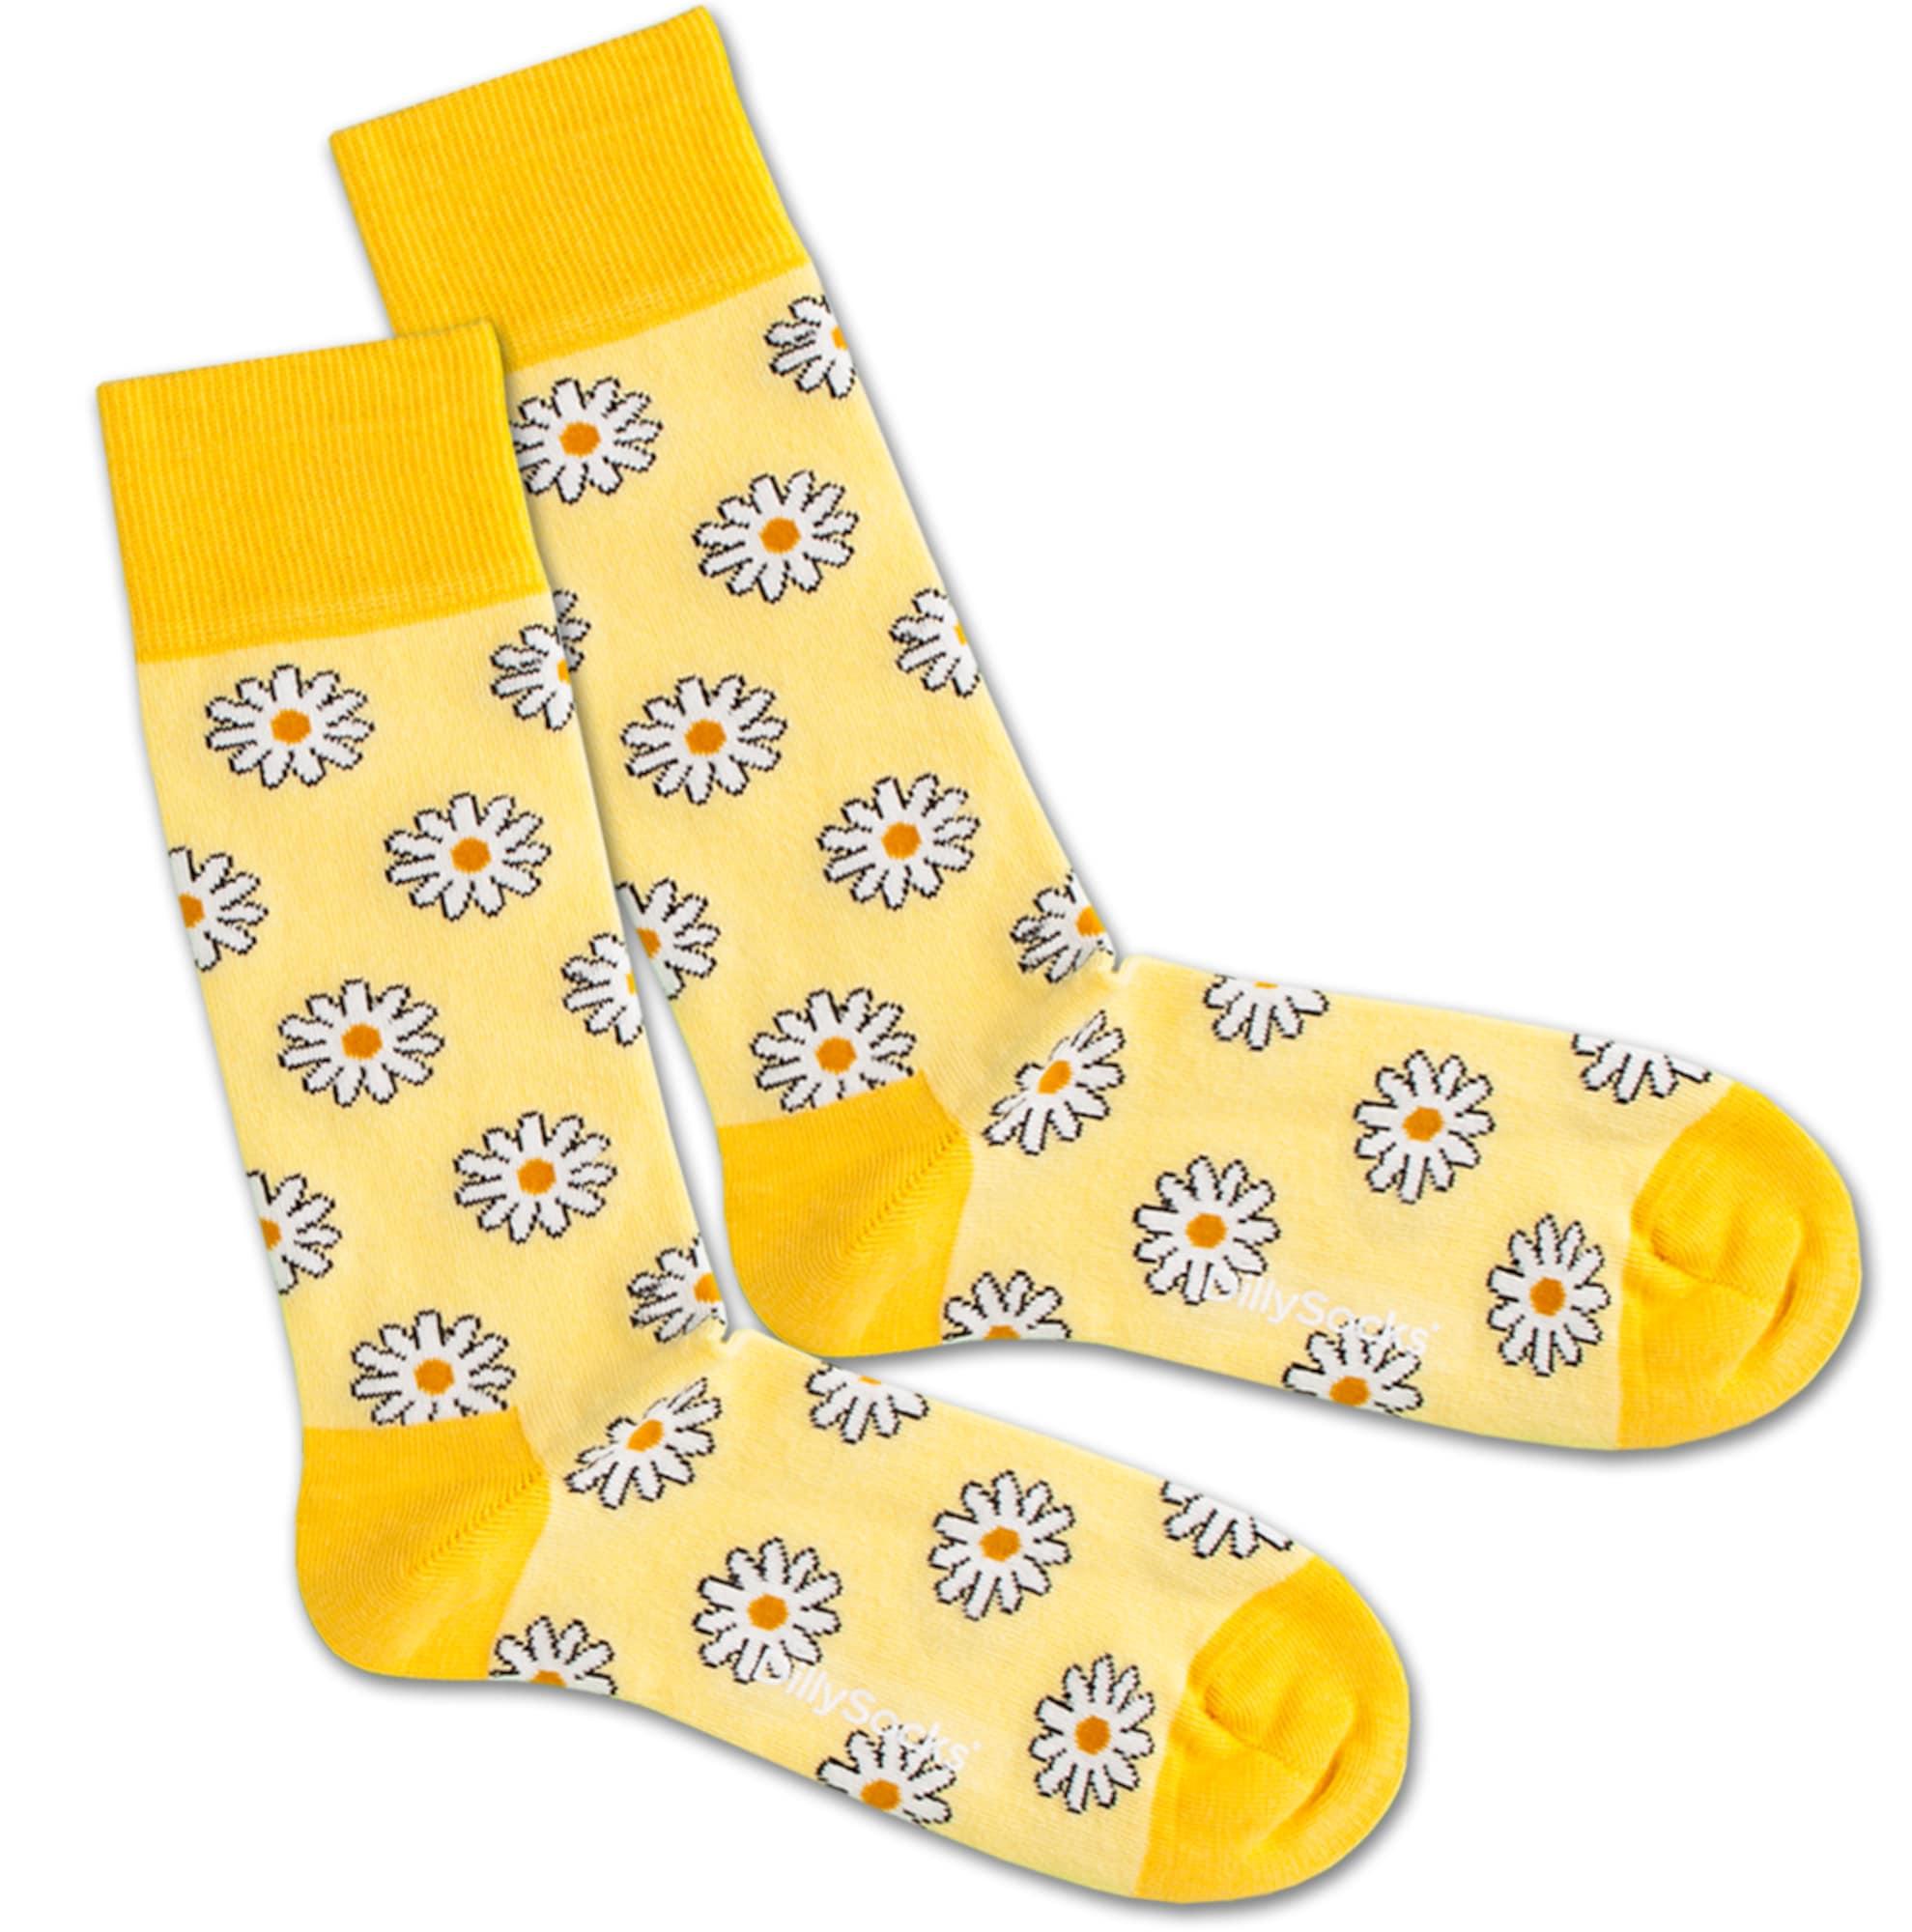 Ponožky Sunny Flower žlutá bílá DillySocks